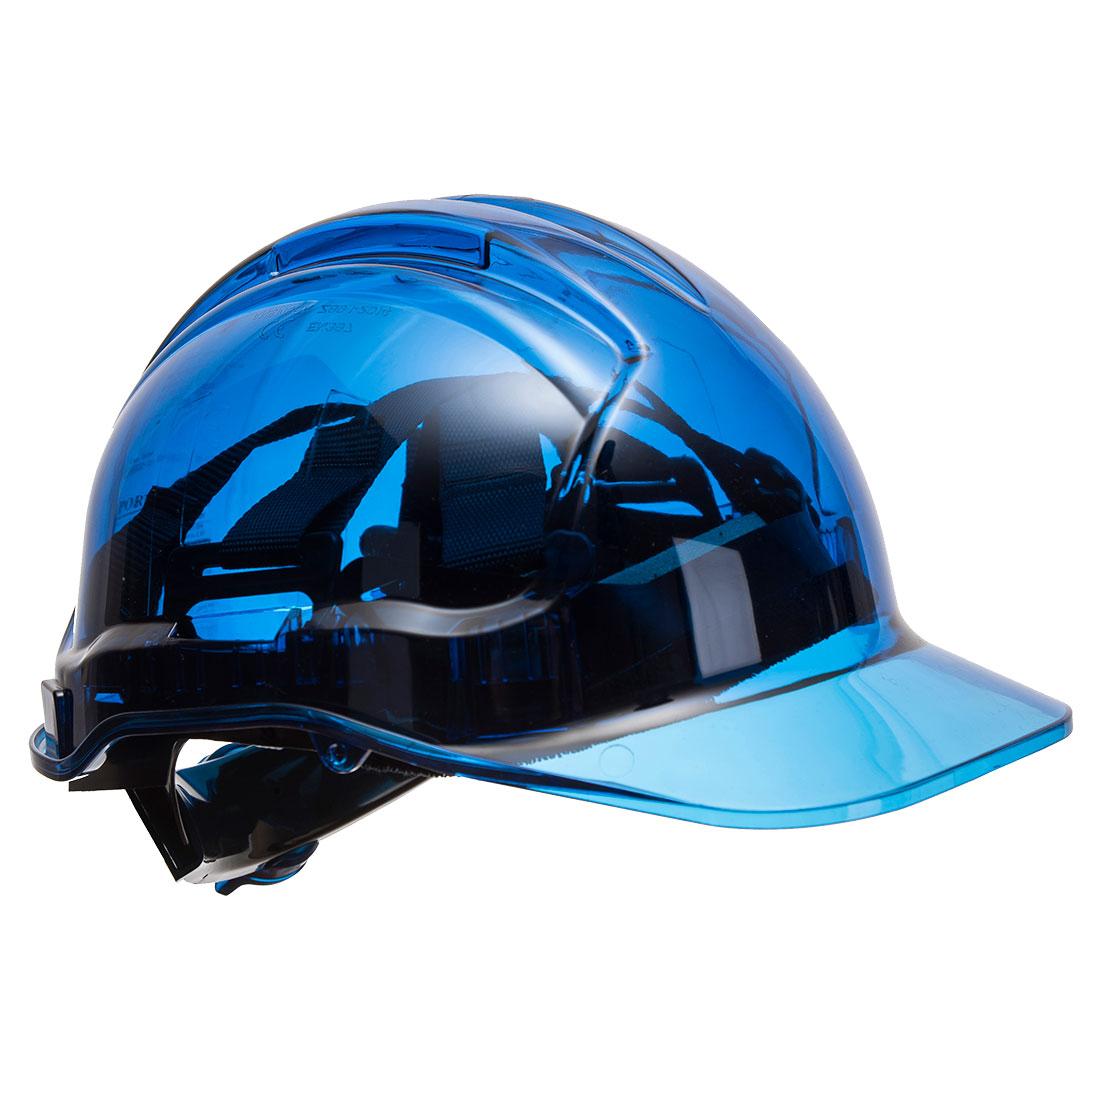 Portwest PV64 Translucent Peak View Ratchet Hard Hat, Blue  U/Fit